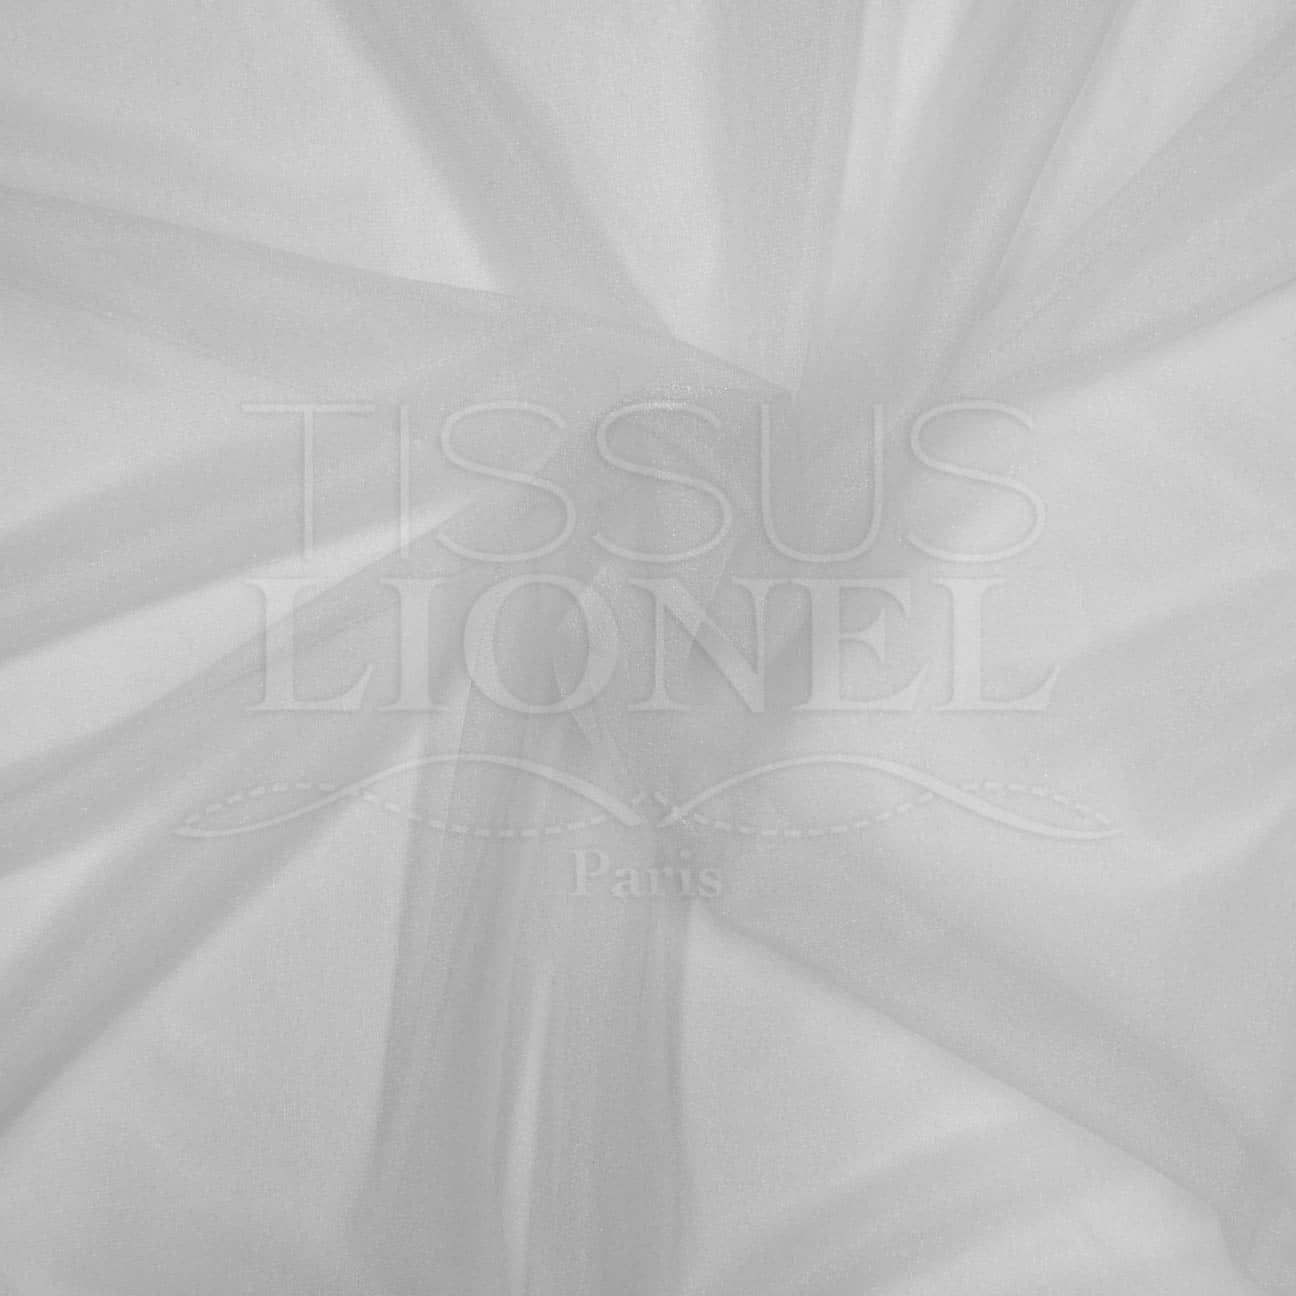 Voile Cristal Blanc Mat Tissus Lionel